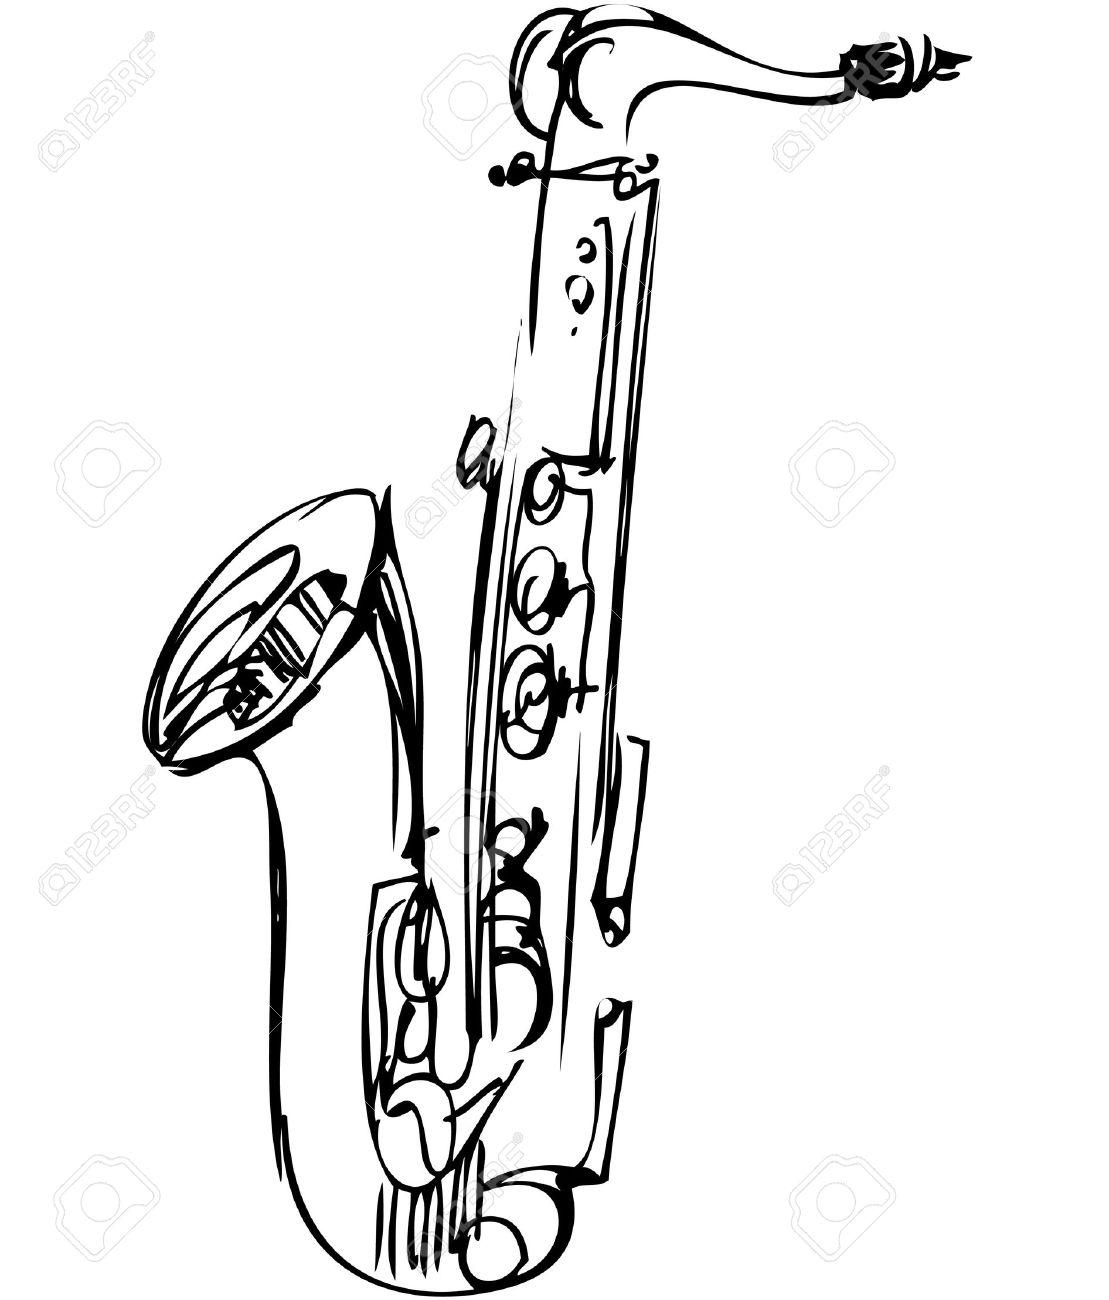 saxophone clip art speakeasy 30s party pinterest saxophones rh pinterest com saxophone player clipart tenor saxophone clipart